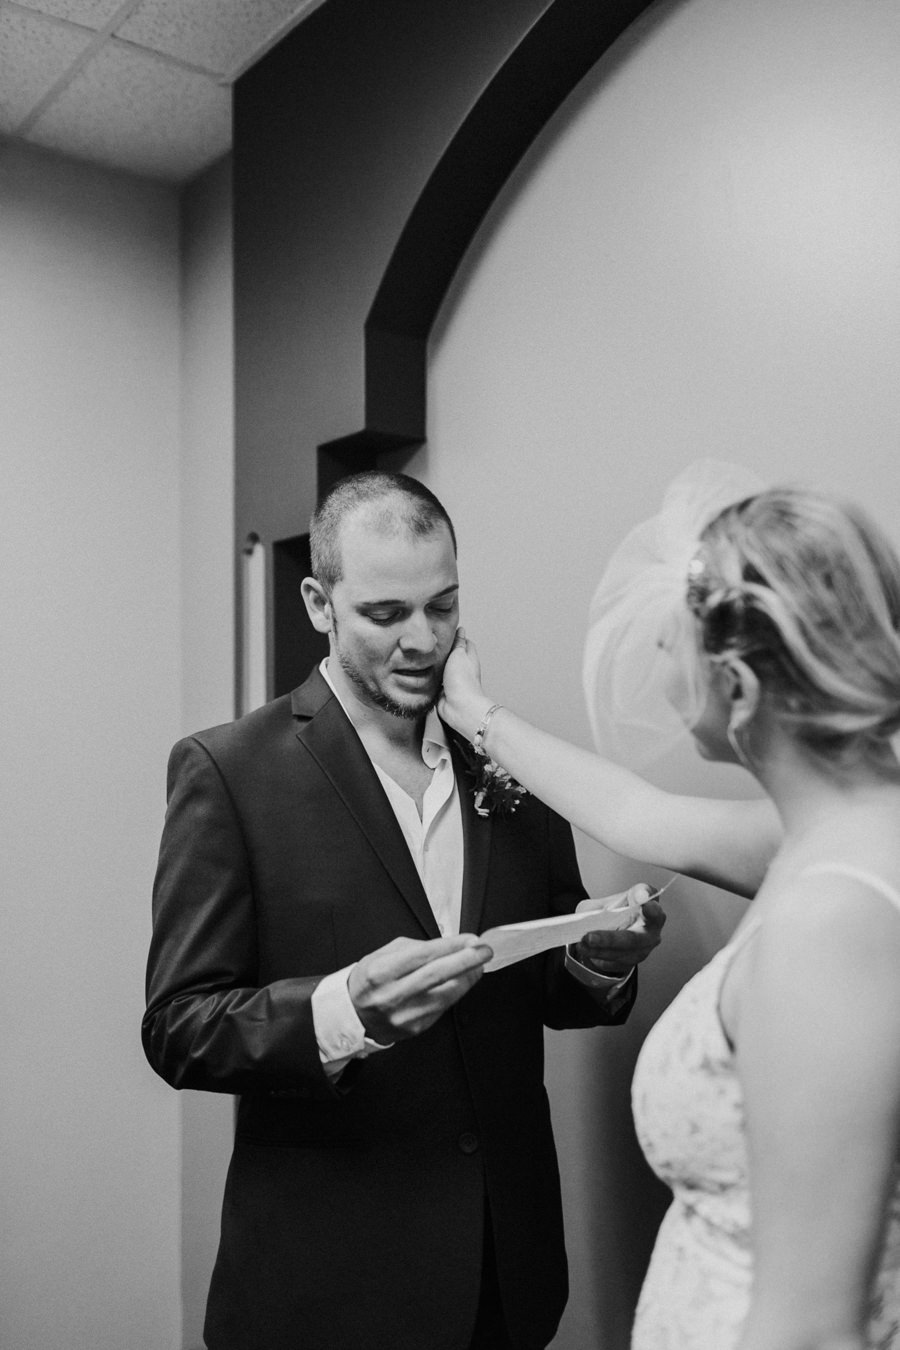 St Pete Elopement Wedding Photography Hotel Zamora-71.jpg